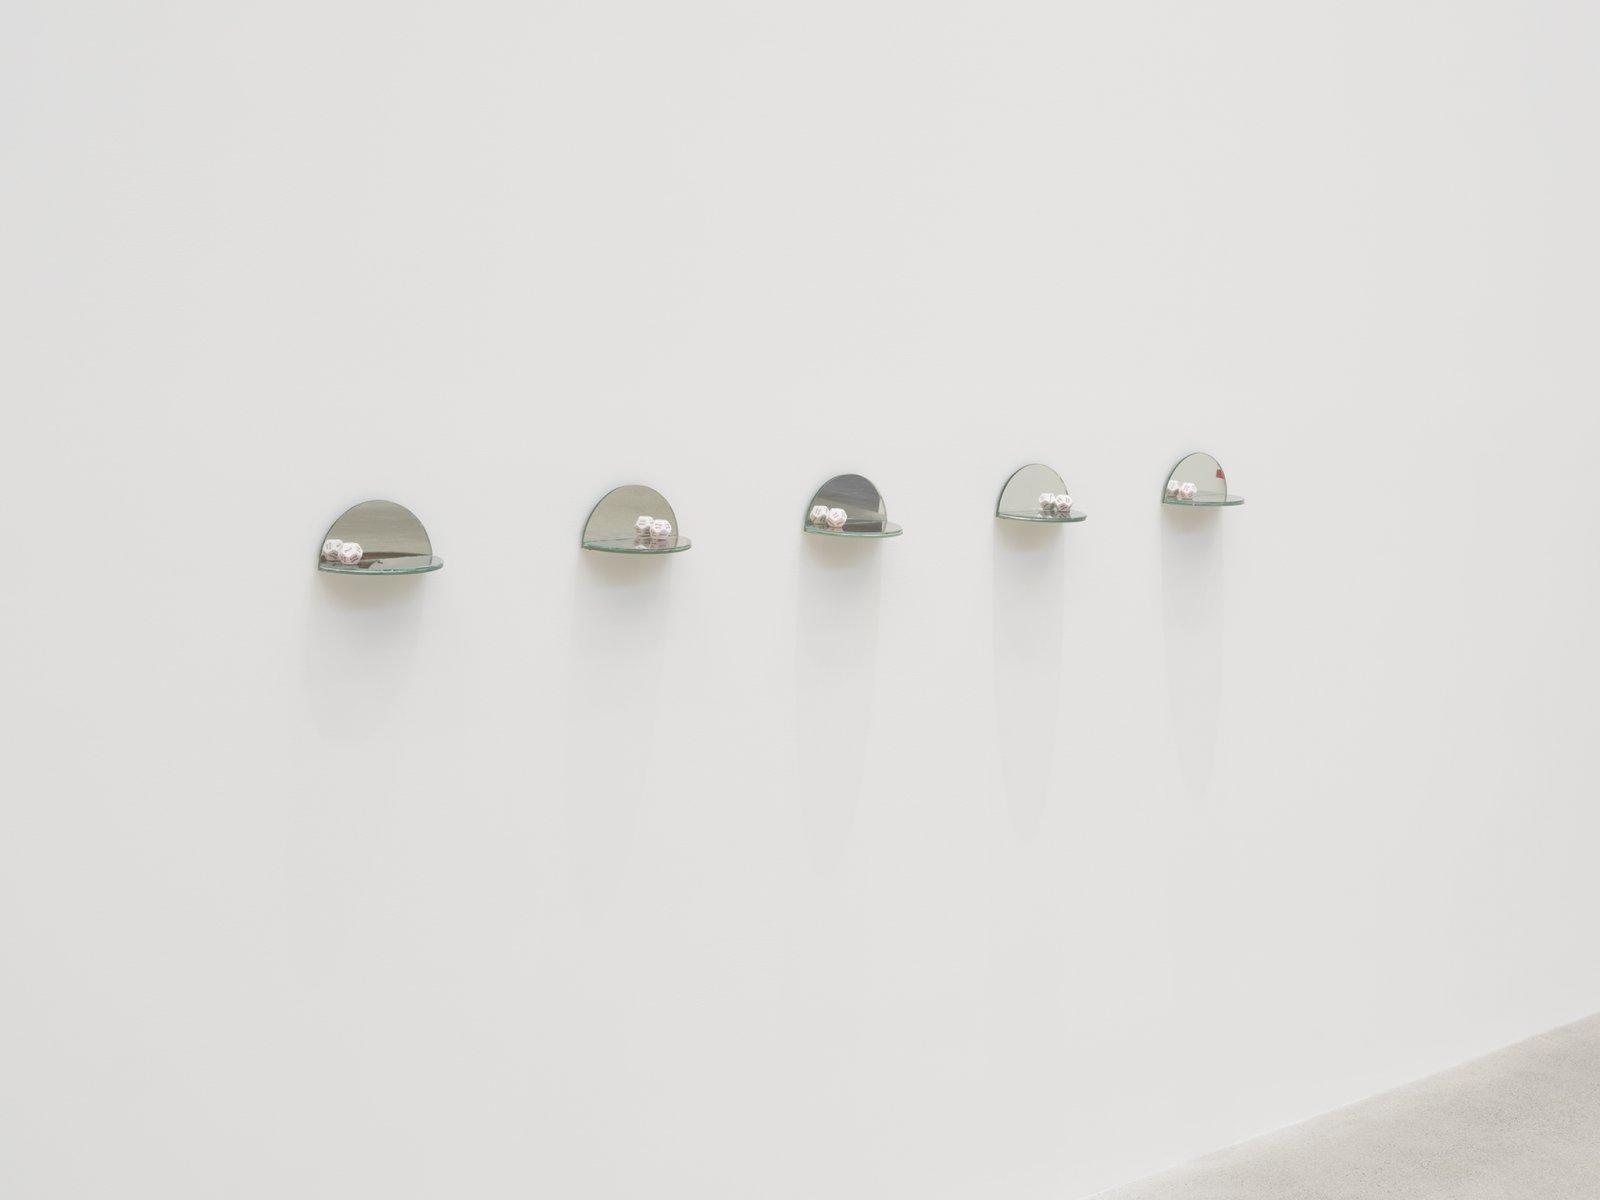 Julia Feyrer, The Ambidextrous Universe, 2018, mirror, liquid mirror, glass, fujiclear transparency, 12-sided die, each 4 x 4 x 7 in. (9 x 9 x 18 cm)